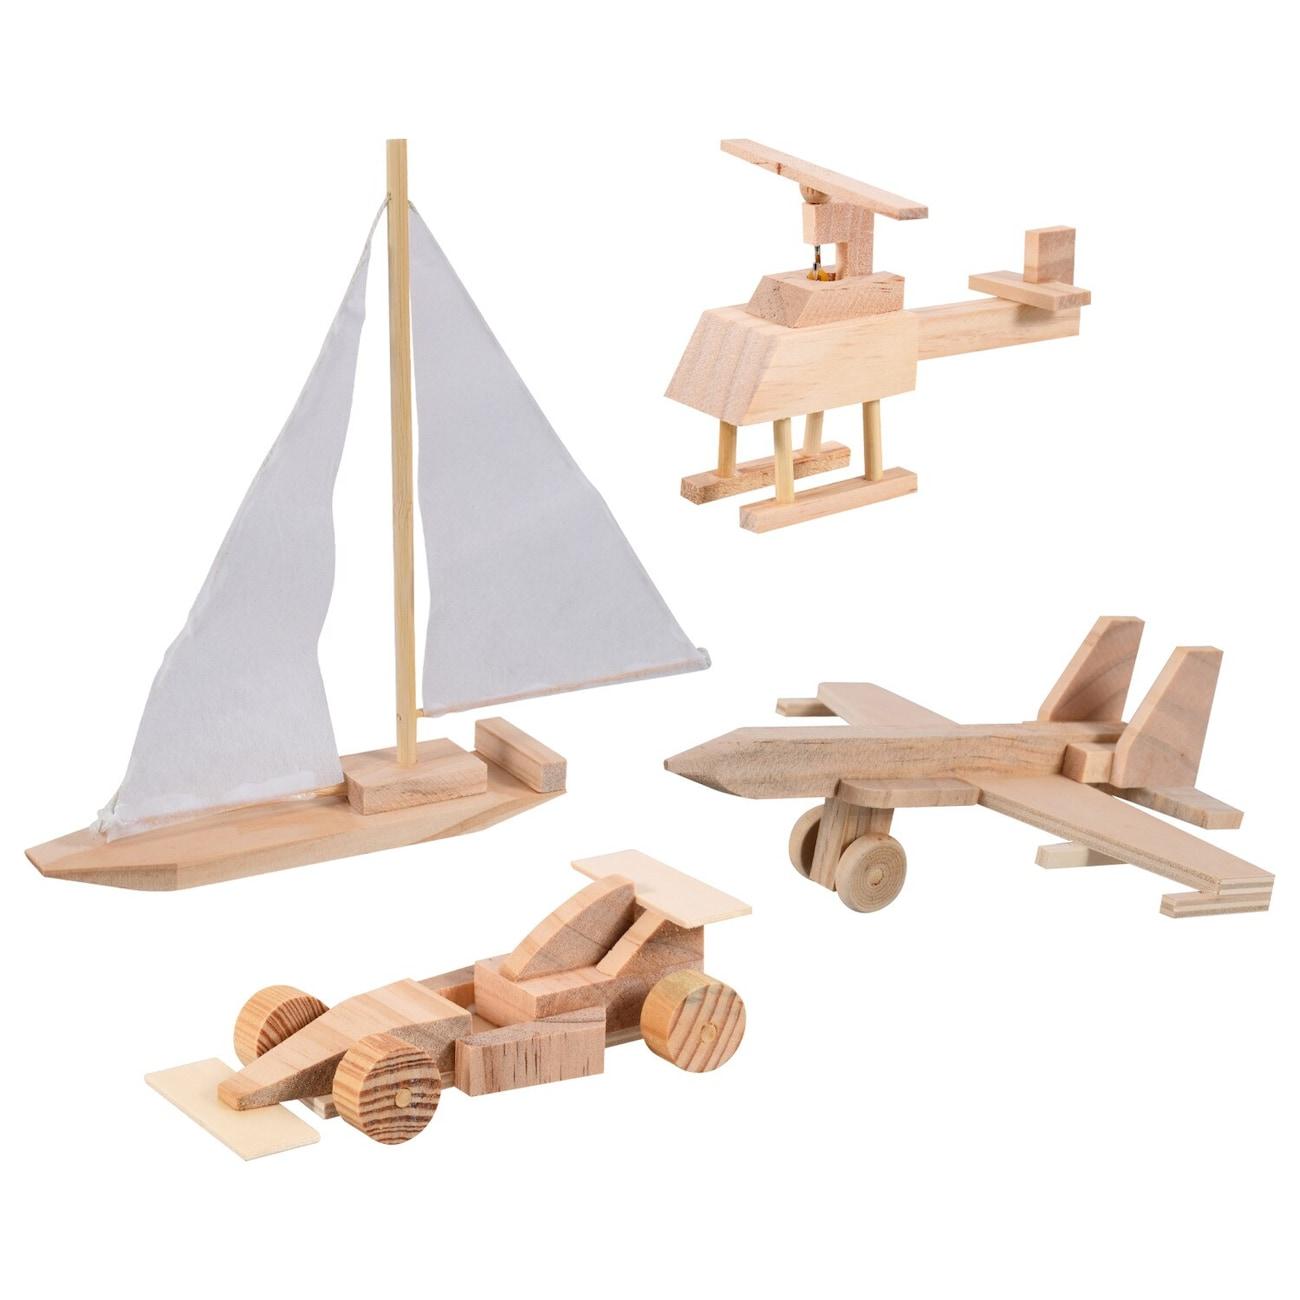 Wood Craft Project Kits